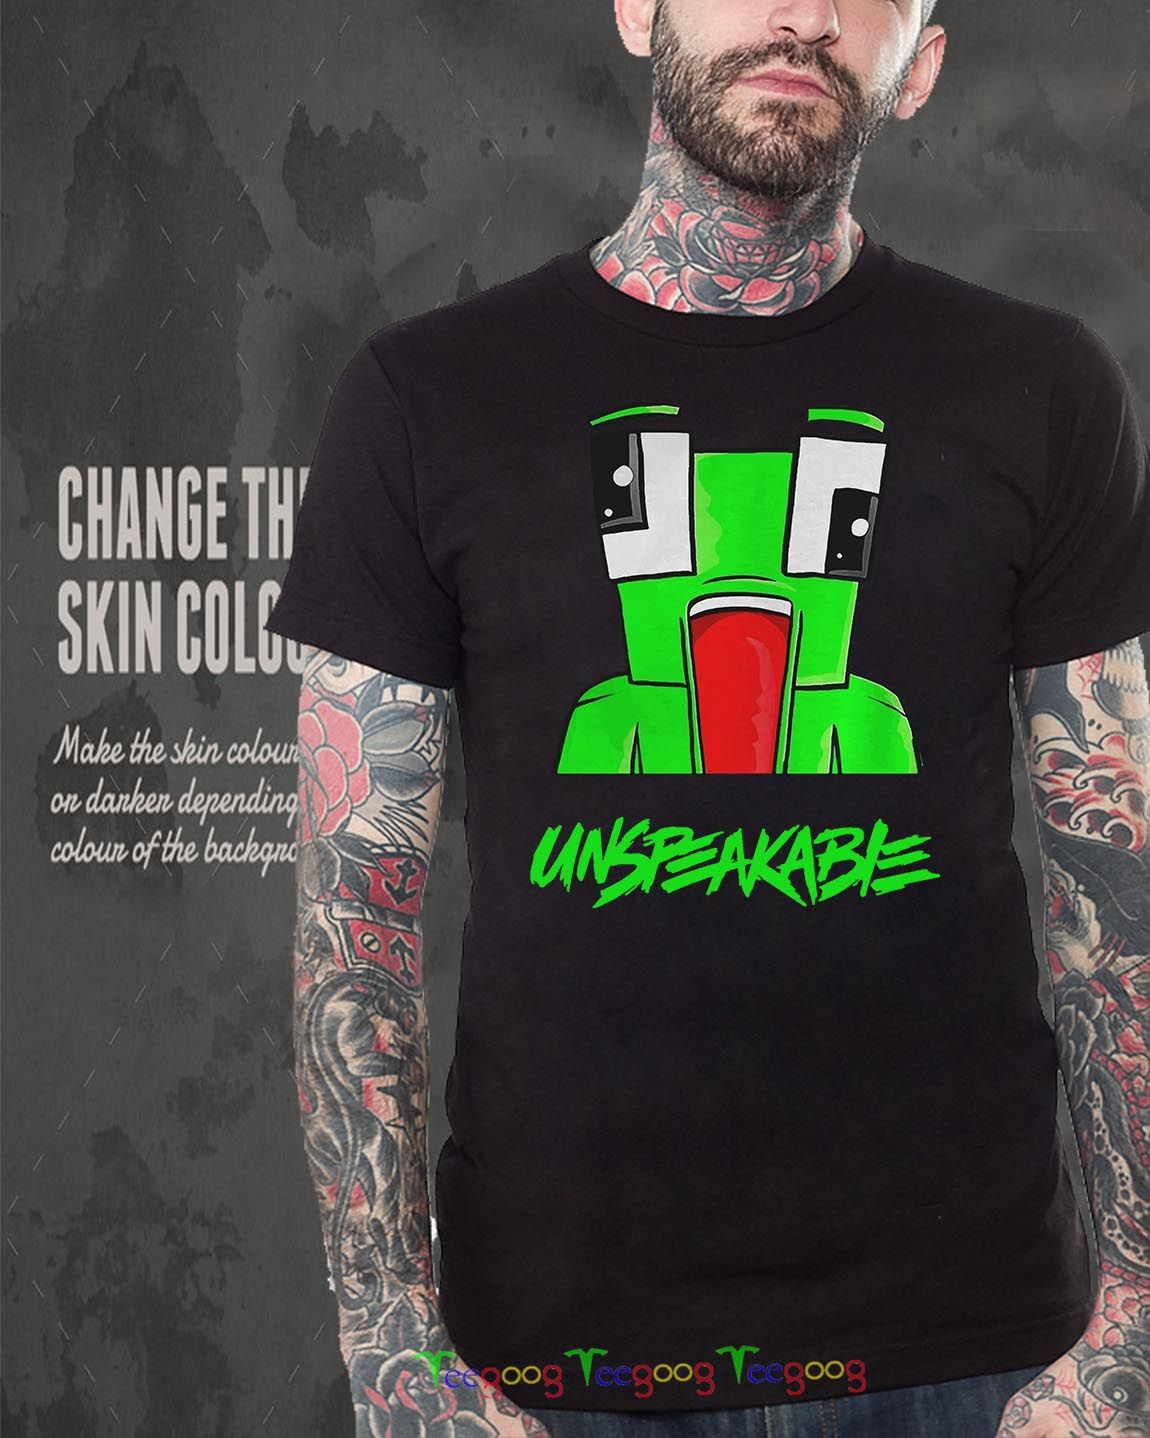 Unspeakable shirt | TrendShirt | Shirts, Mens tops, Sweaters